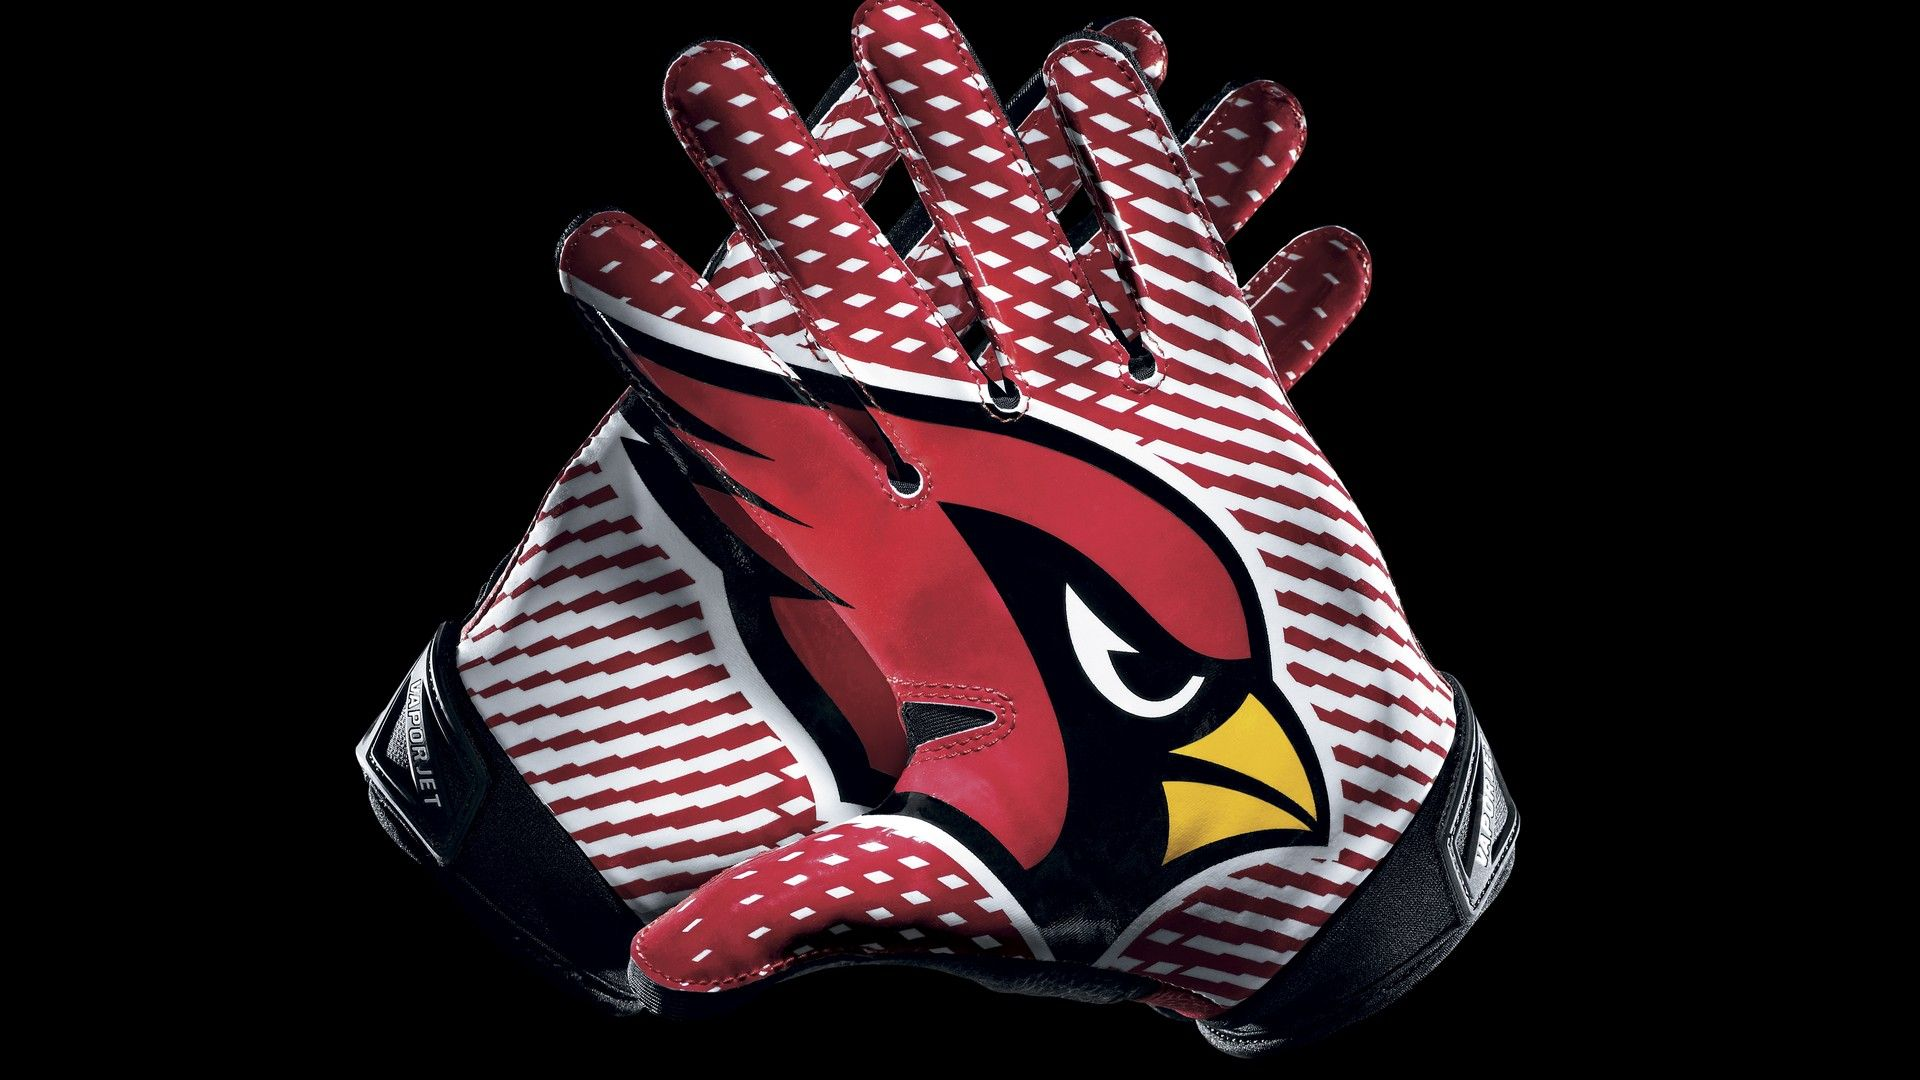 Wallpapers Hd Arizona Cardinals 2020 Nfl Football Wallpapers Cardinals Football Arizona Cardinals Arizona Cardinals Football